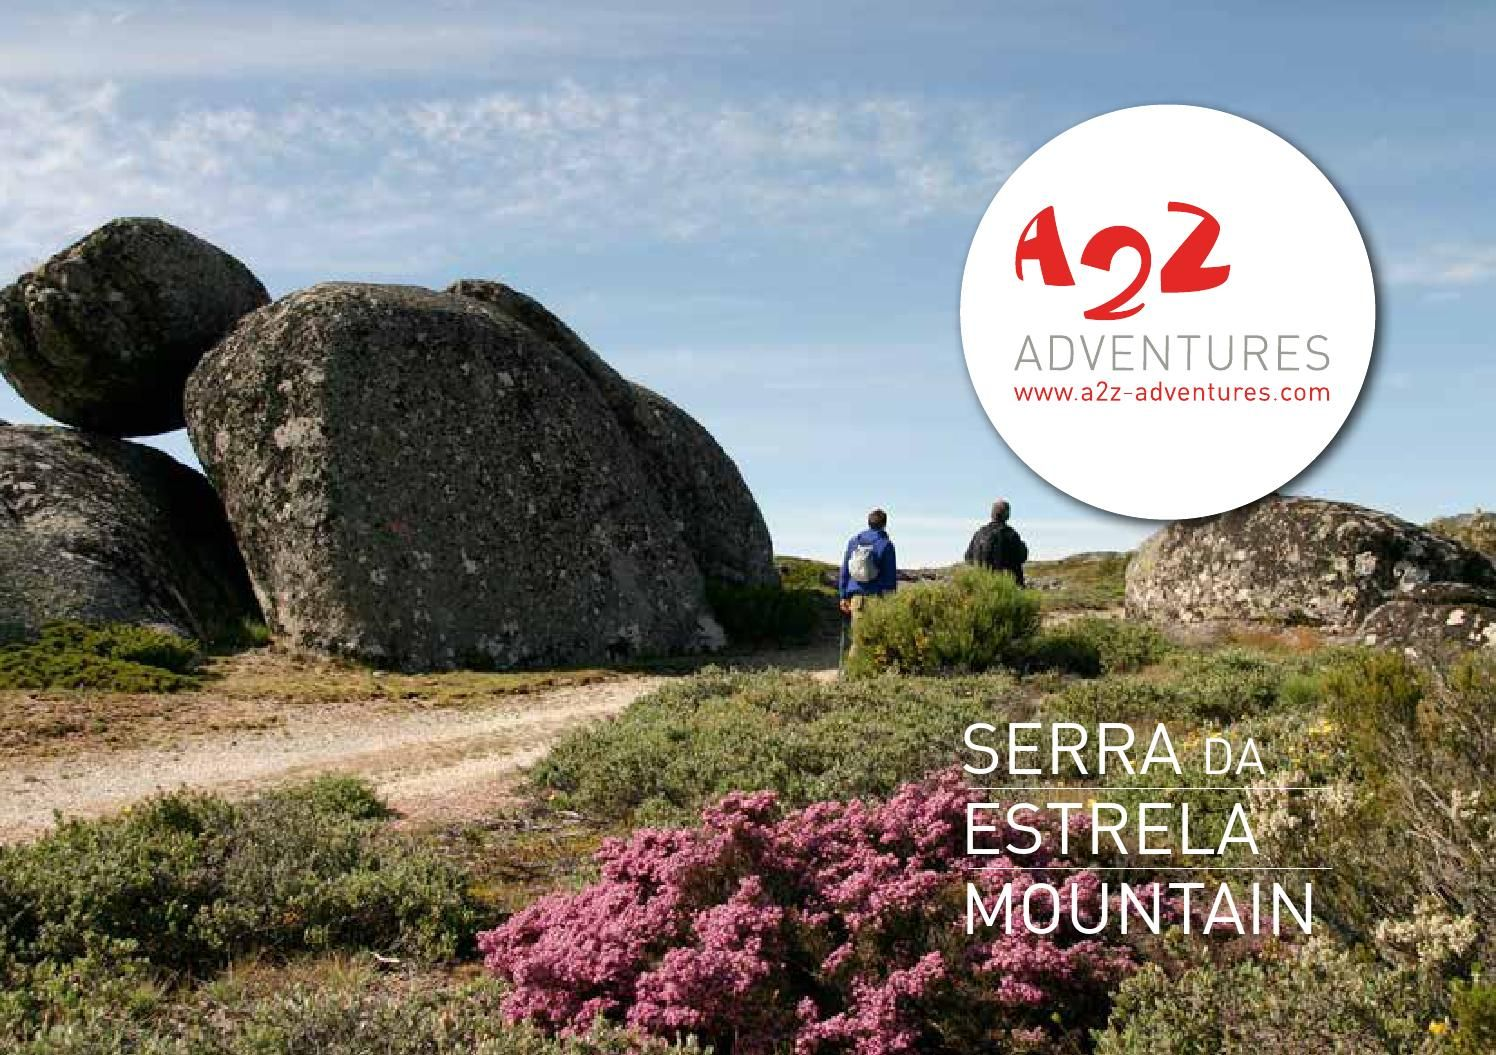 Serra da Estrela Mountain  The highest mountain in mainland Portugal to be discovered walking or biking.